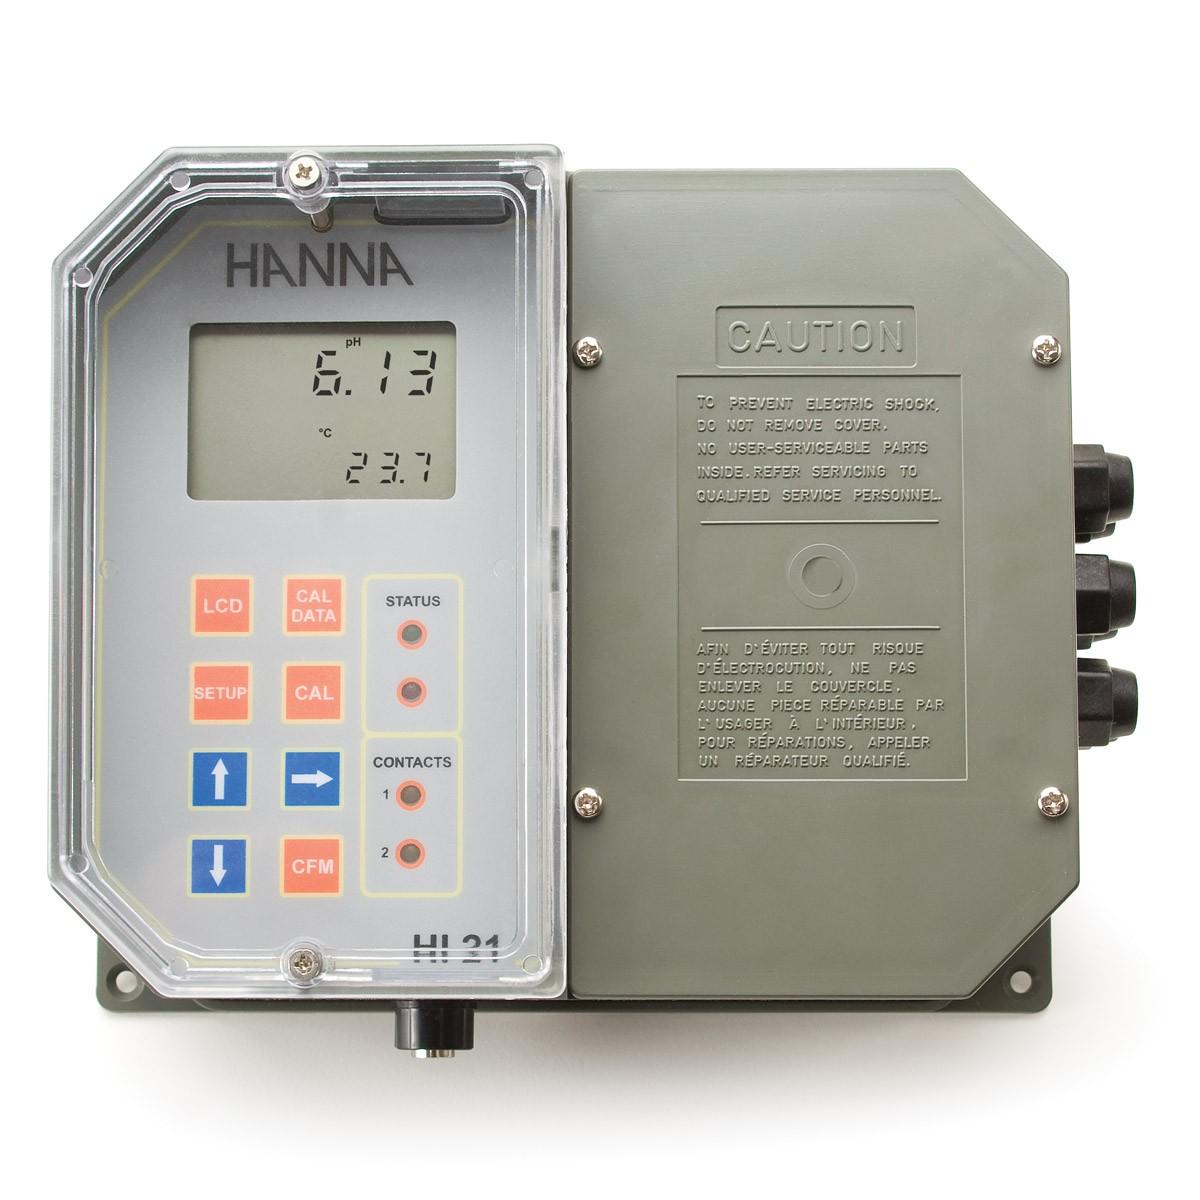 Wall Mounted pH Digital Controller with Dual Setpoint - HI21211